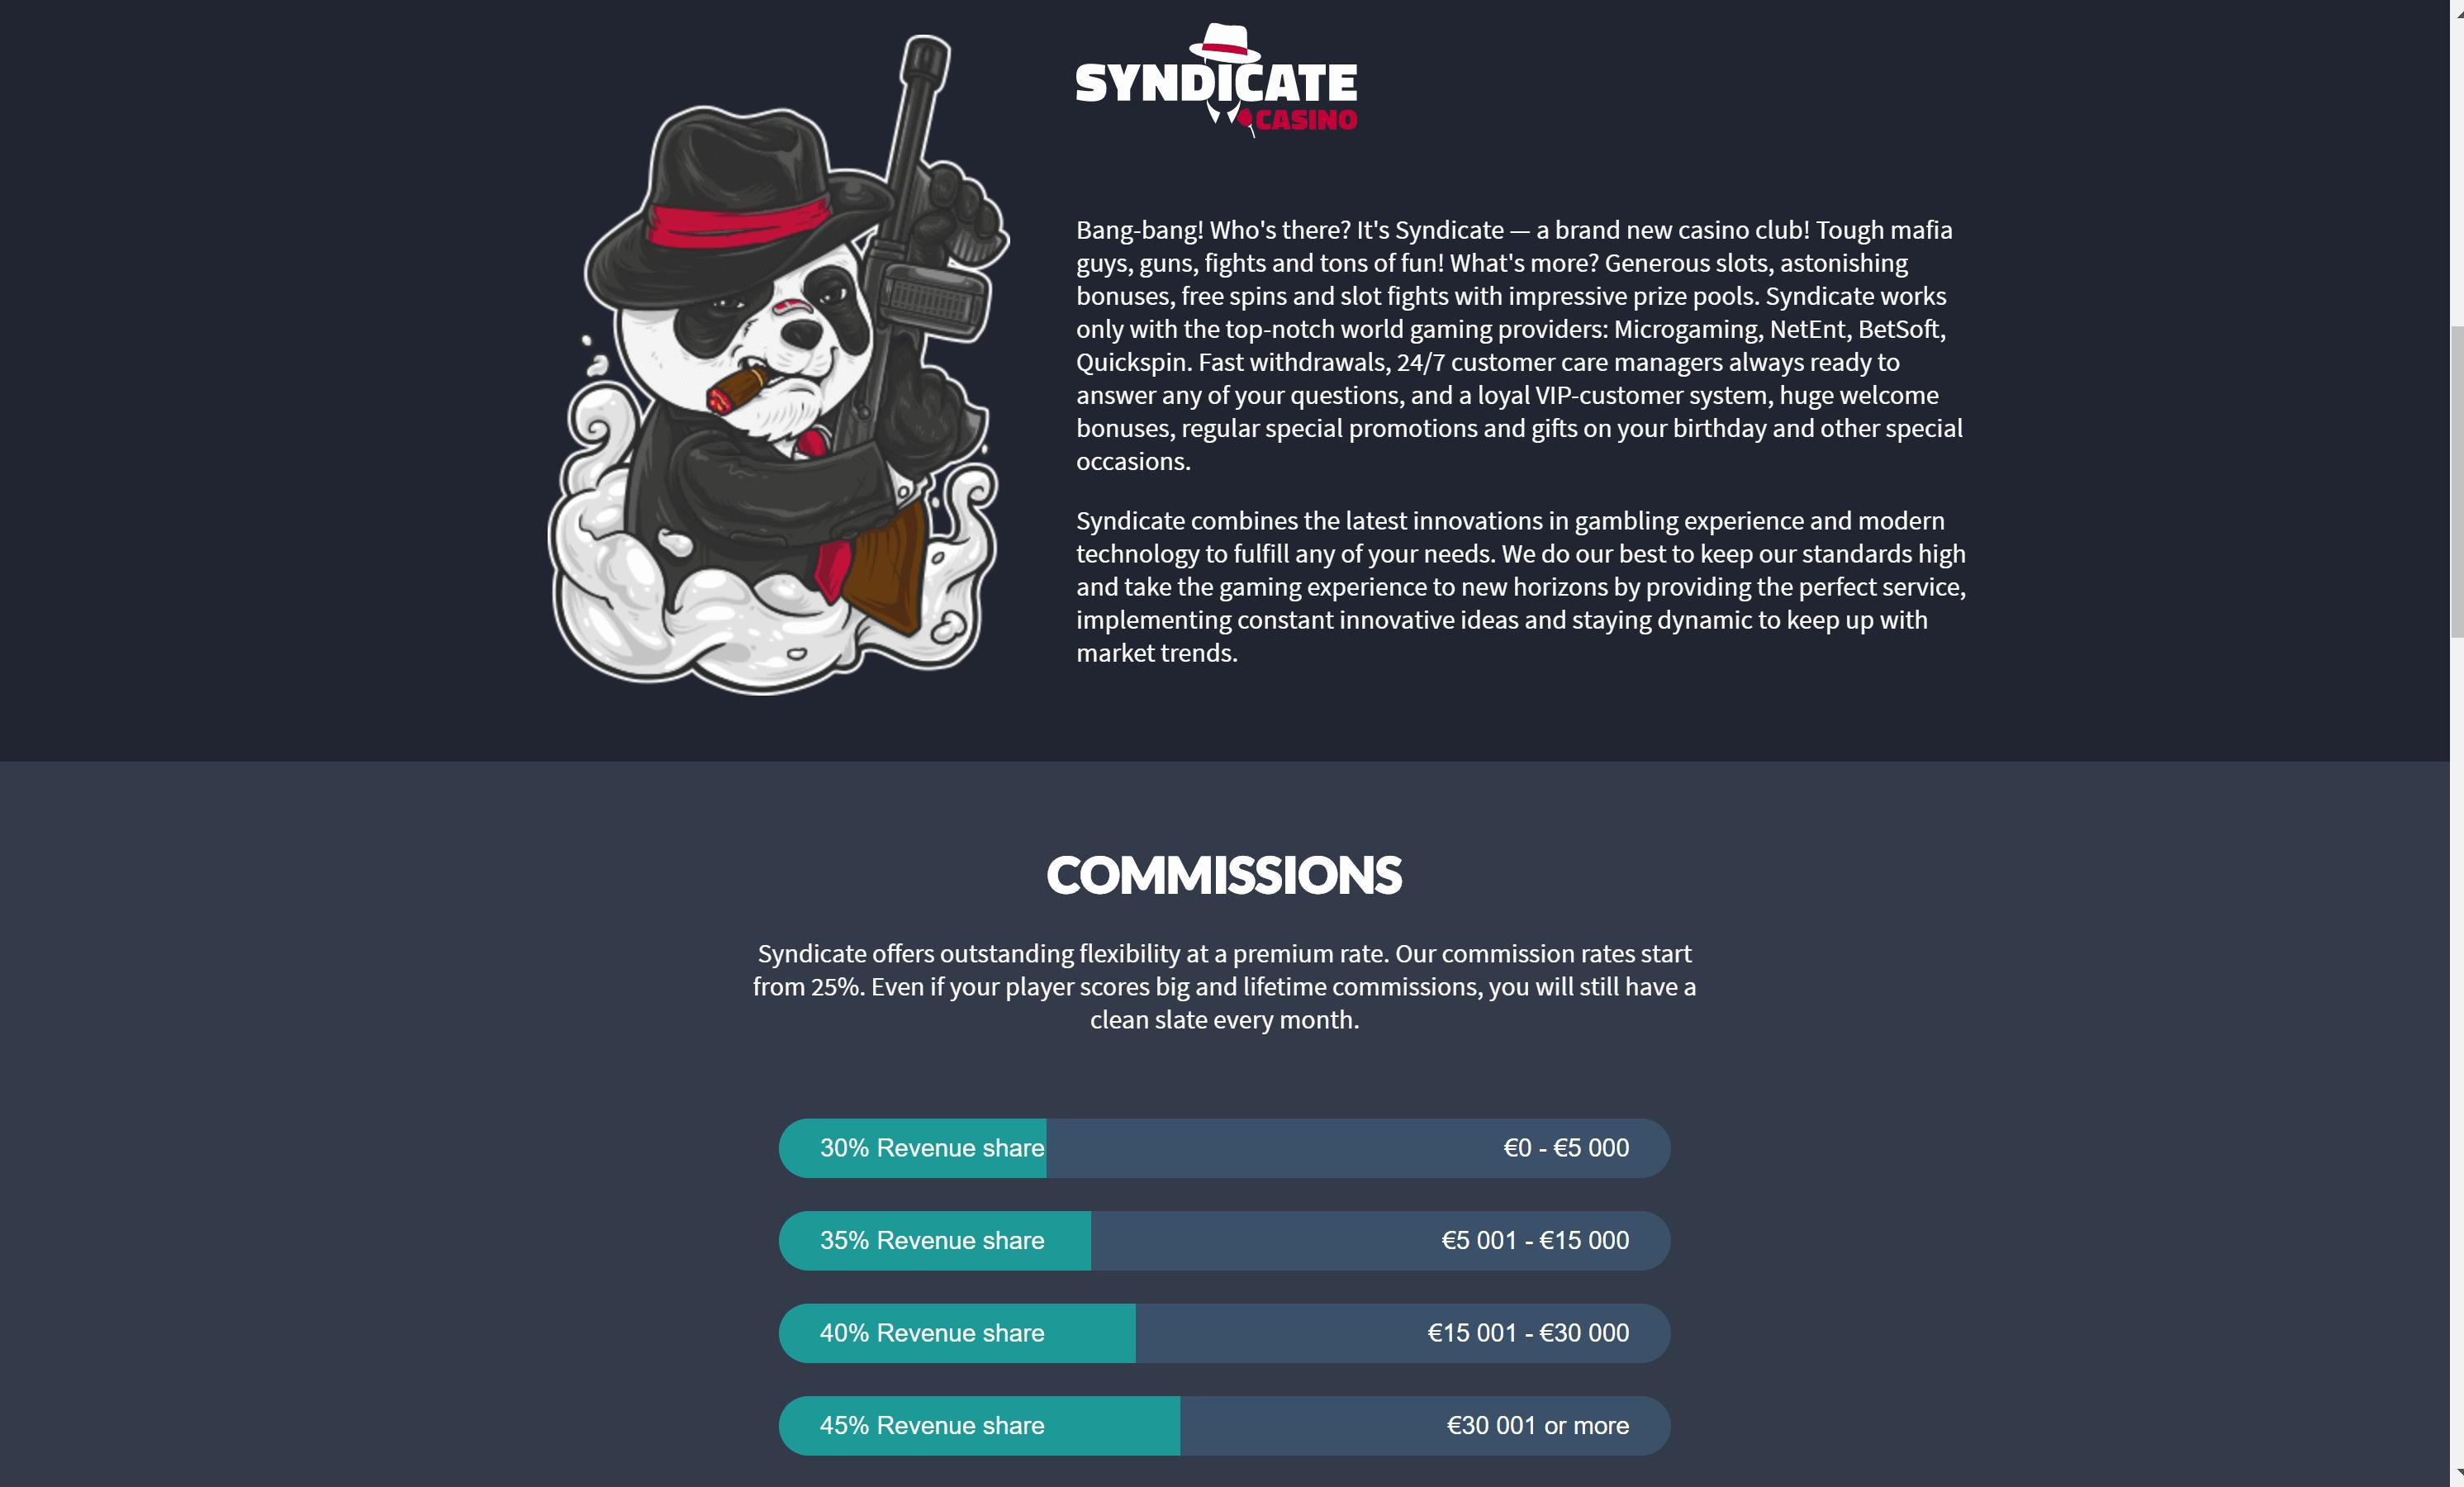 Affiliate Program of Syndicate casino